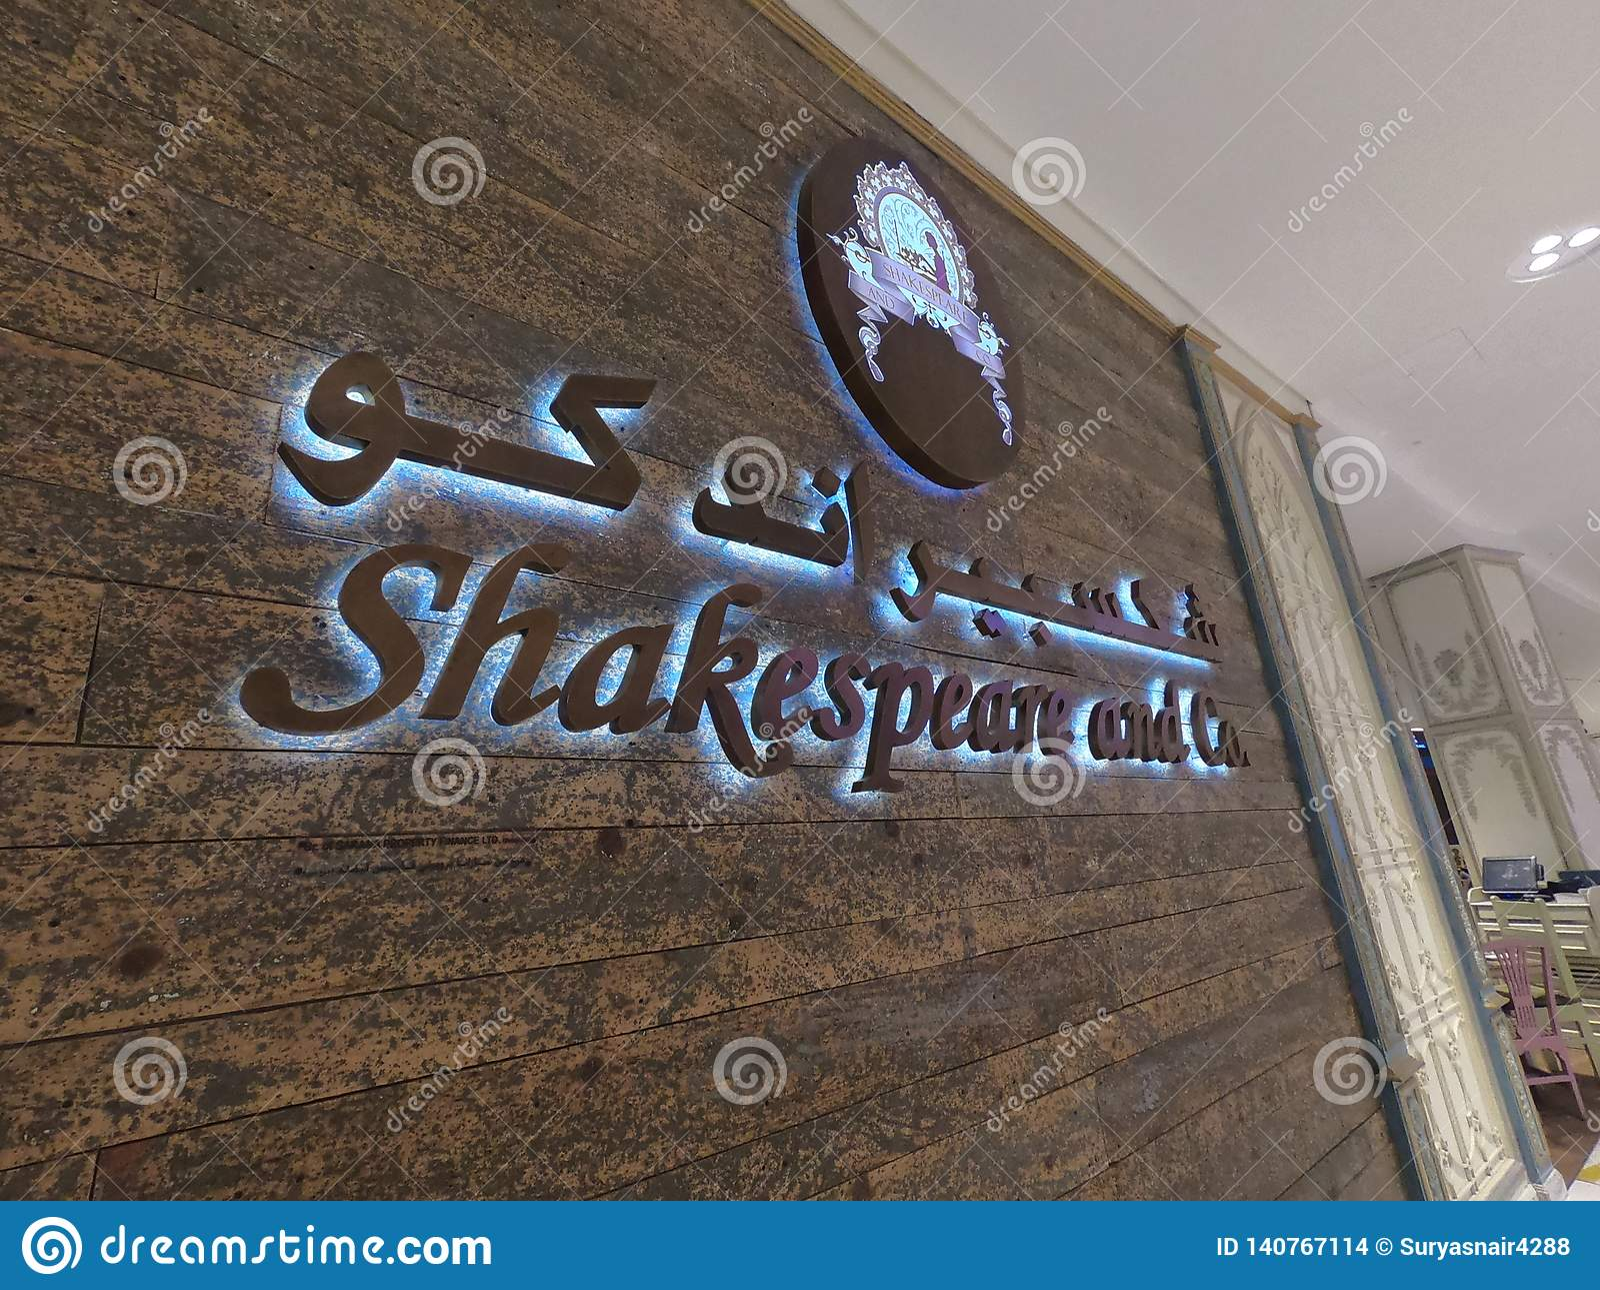 Dubai Uae February 2019 Logo And Name Of Restaurant